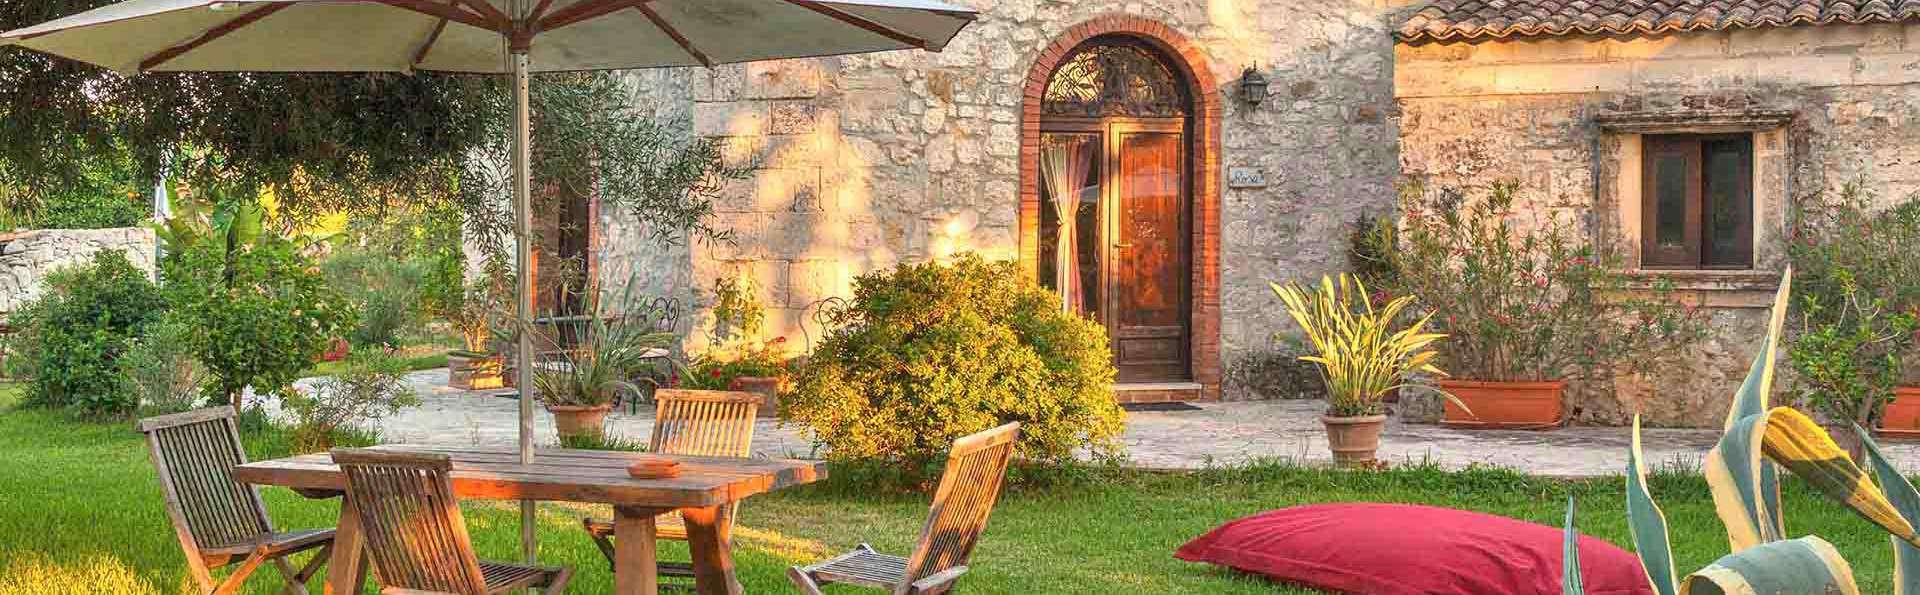 Villa Dei Papiri - EDIT_Esterno_Superior_02.jpg